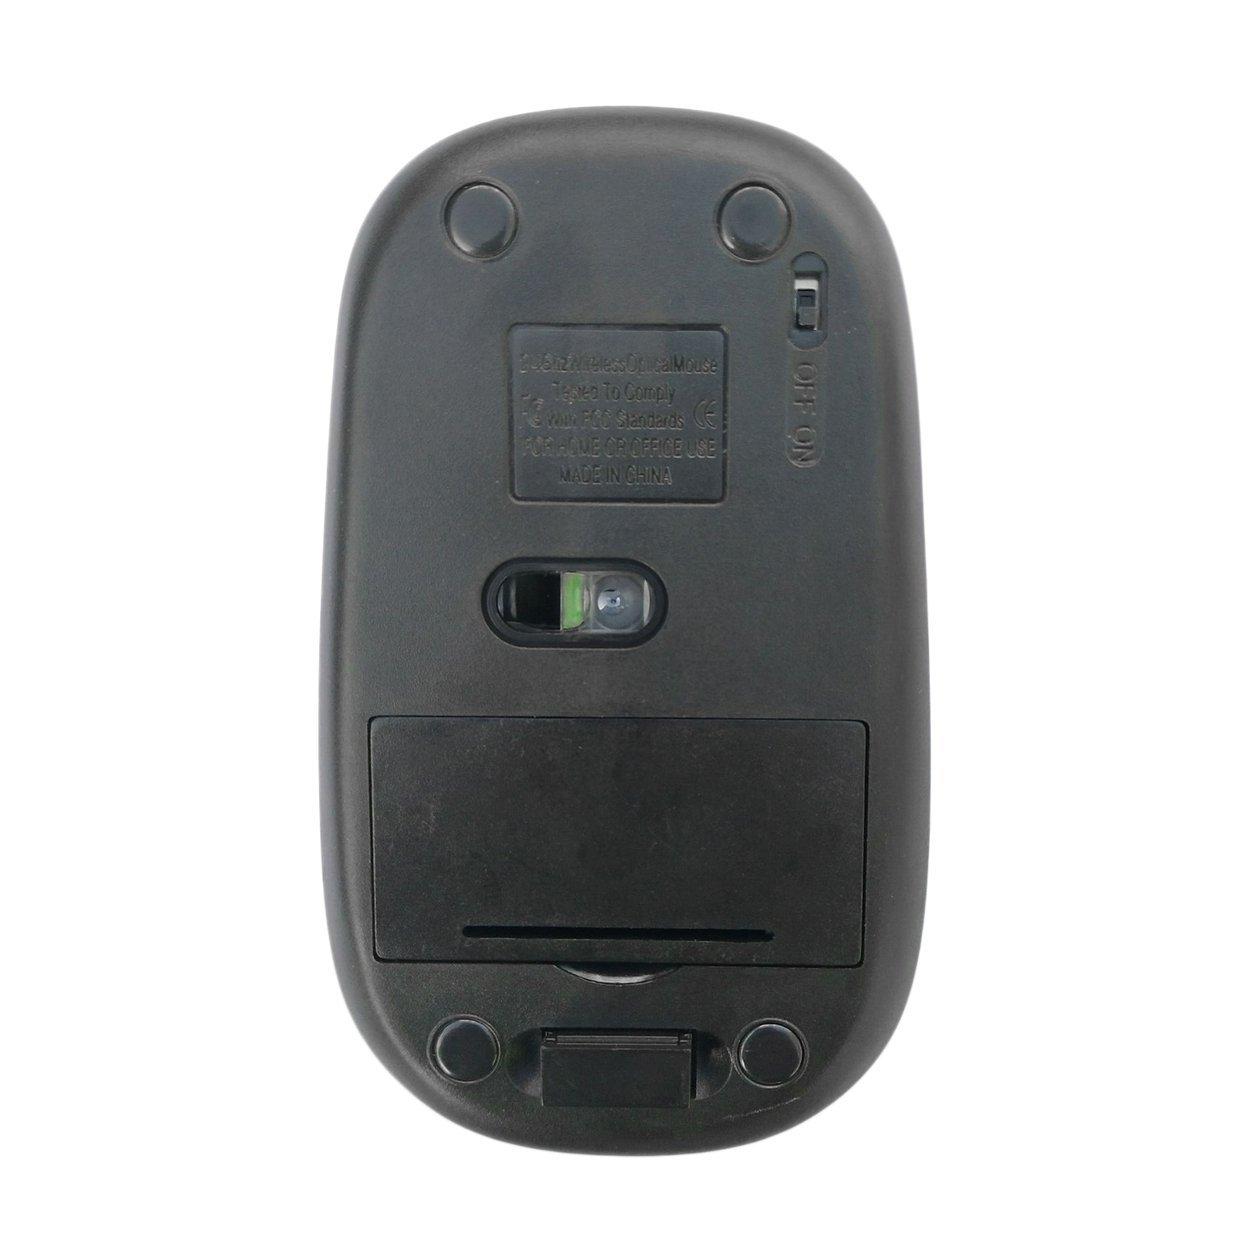 HONGIGI Dise/ño ergon/ómico C/ómodo 2.4GHz Ultra-Slim Mini 1600DPI USB Rat/ón /óptico inal/ámbrico Rat/ón de computadora para computadora port/átil PC JP-350 Color: JP-350 Silver